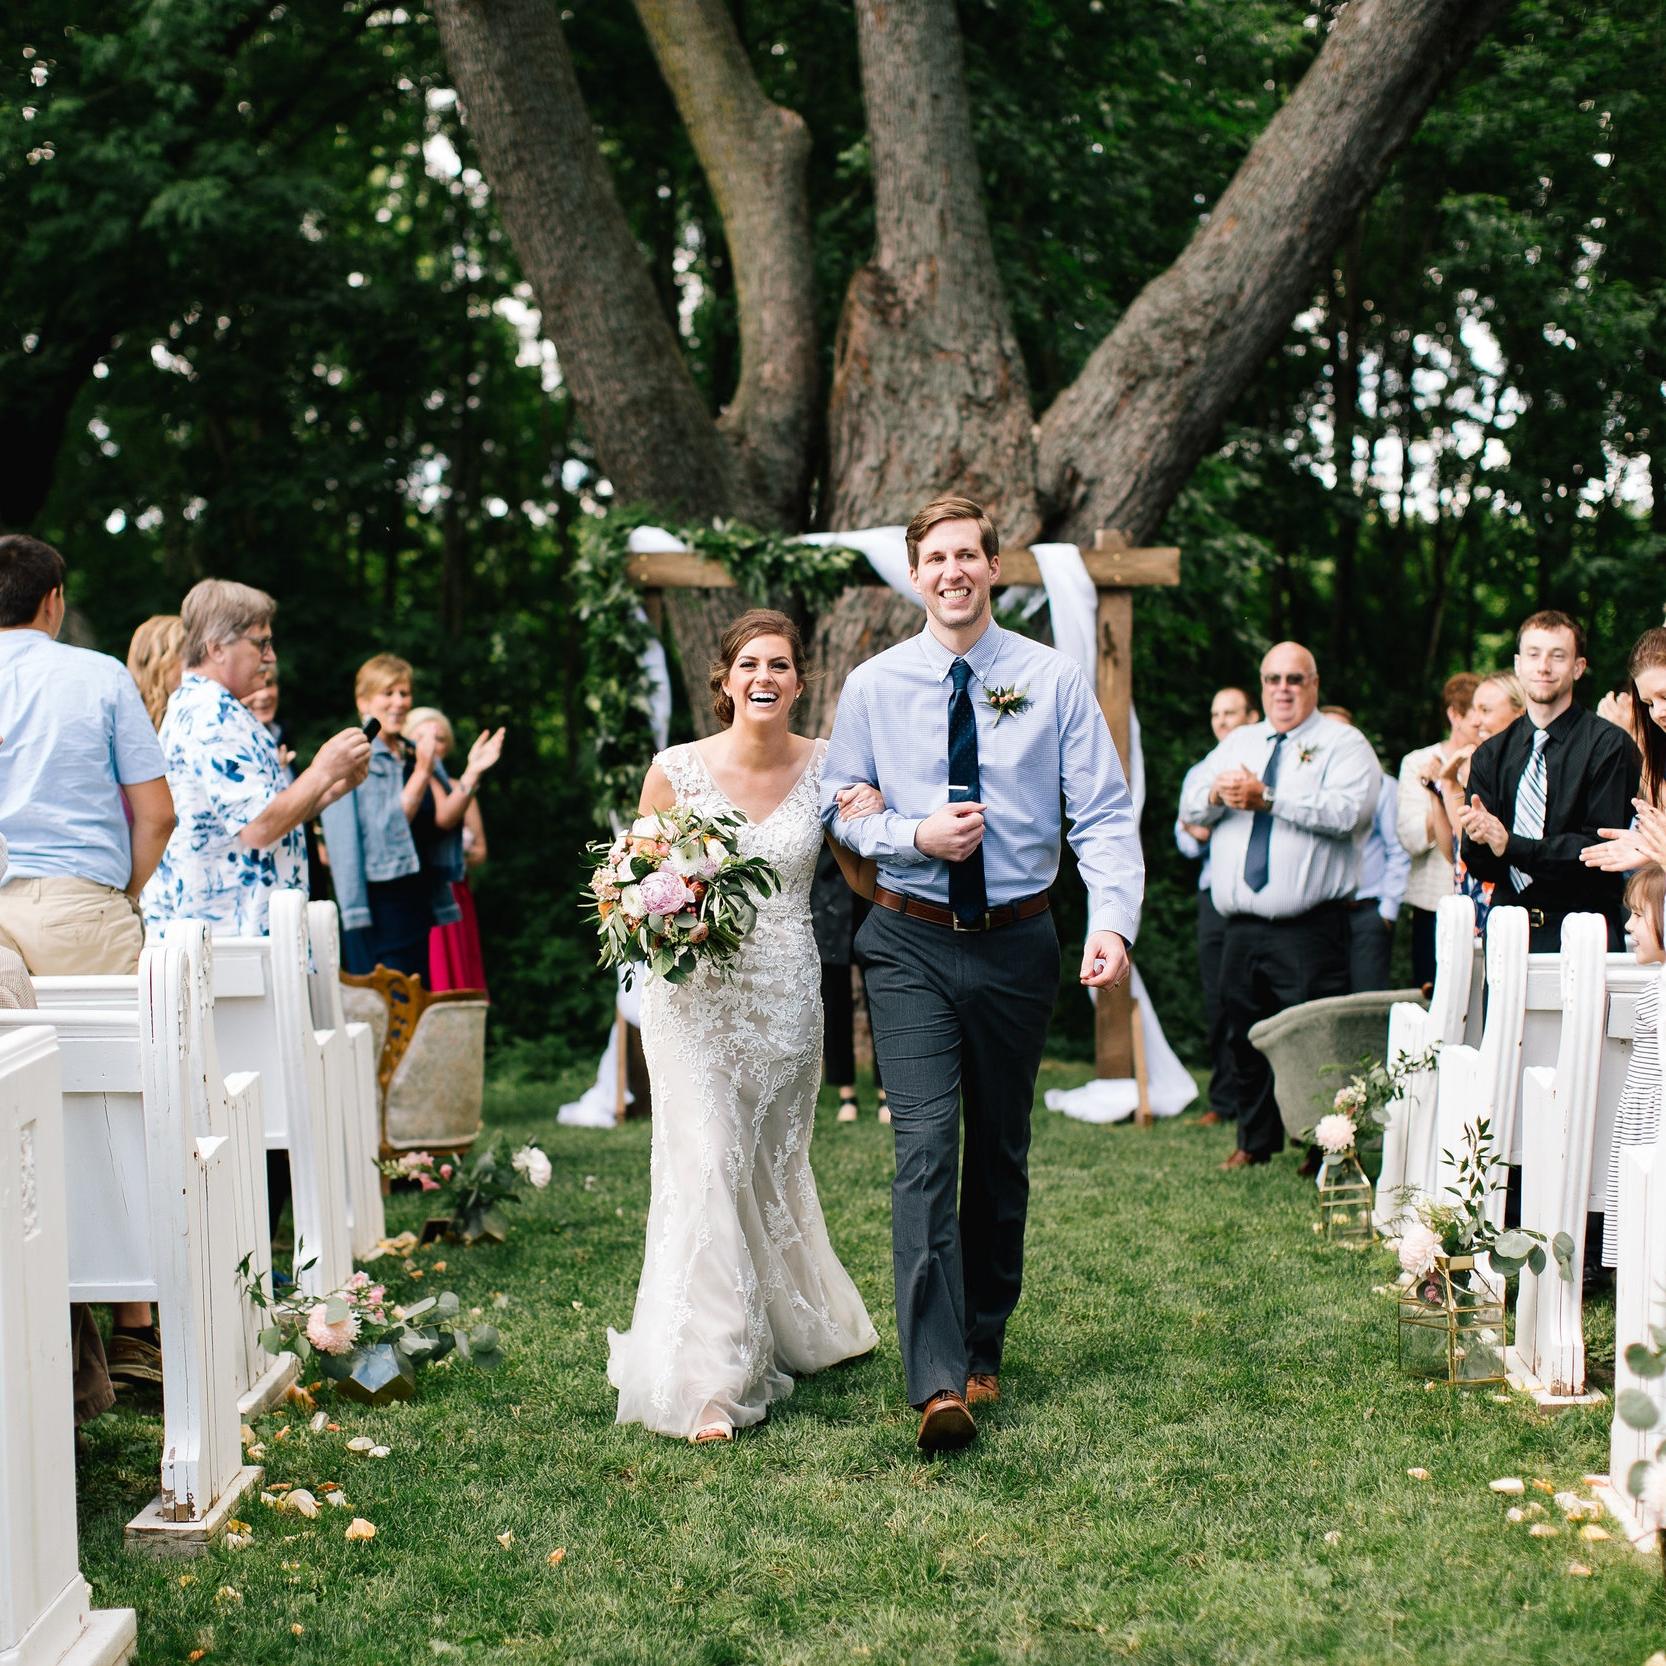 JADE + SETH // BLOOM LAKE BARN WEDDING